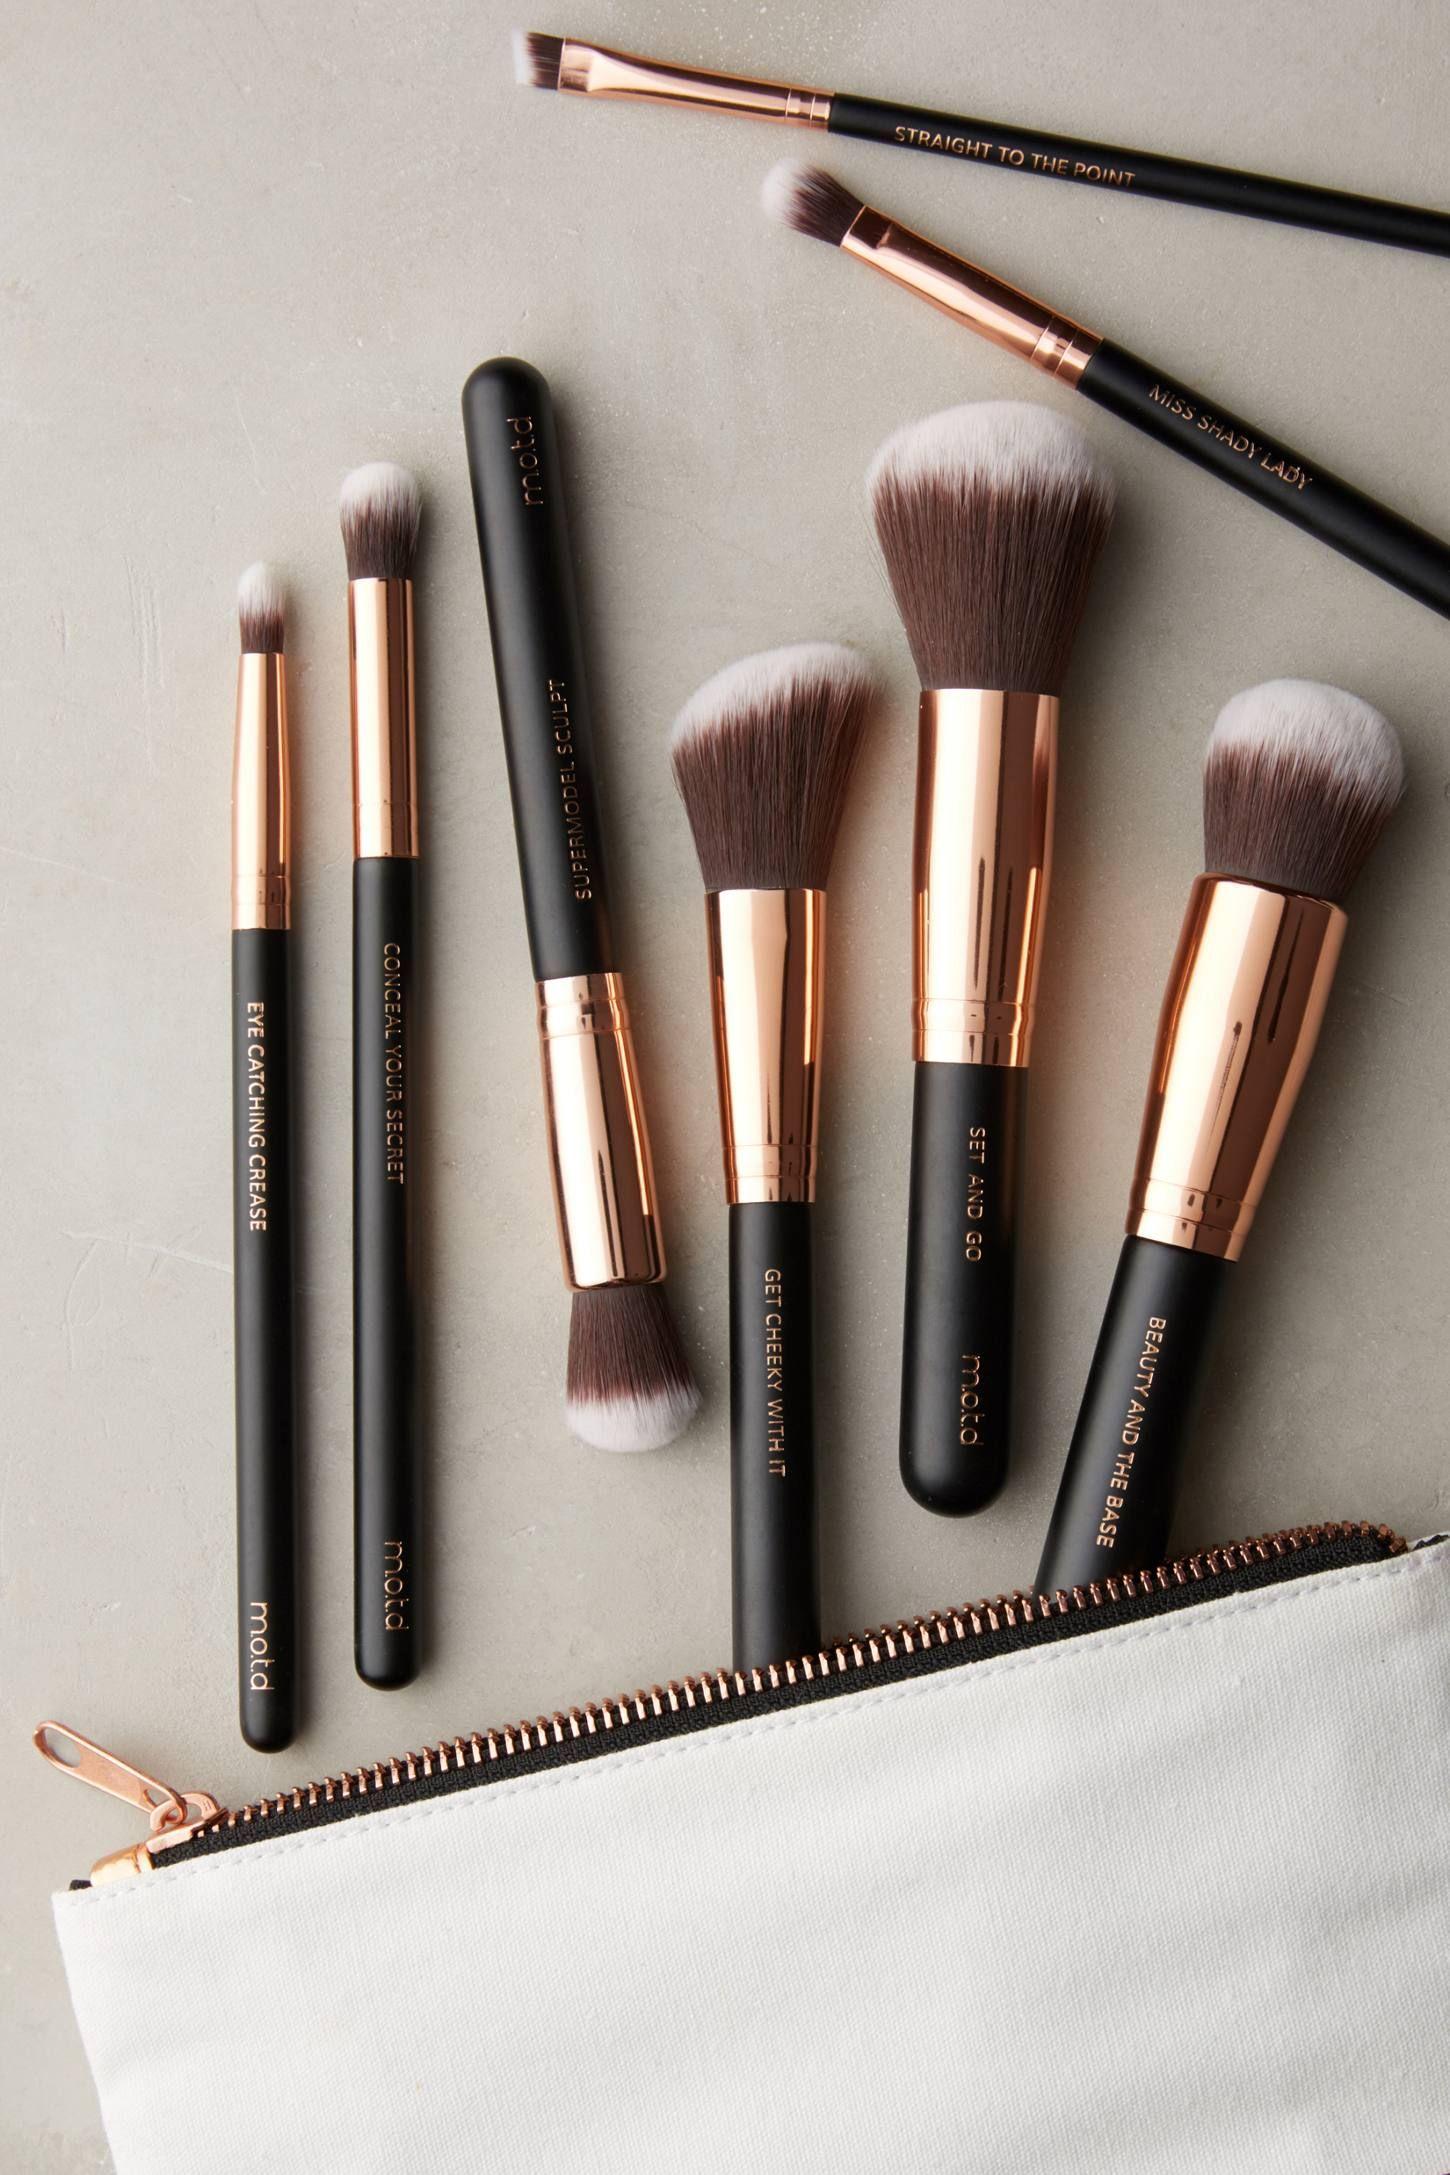 M.O.T.D. Essential Vegan Makeup Brush Set Makeup brush